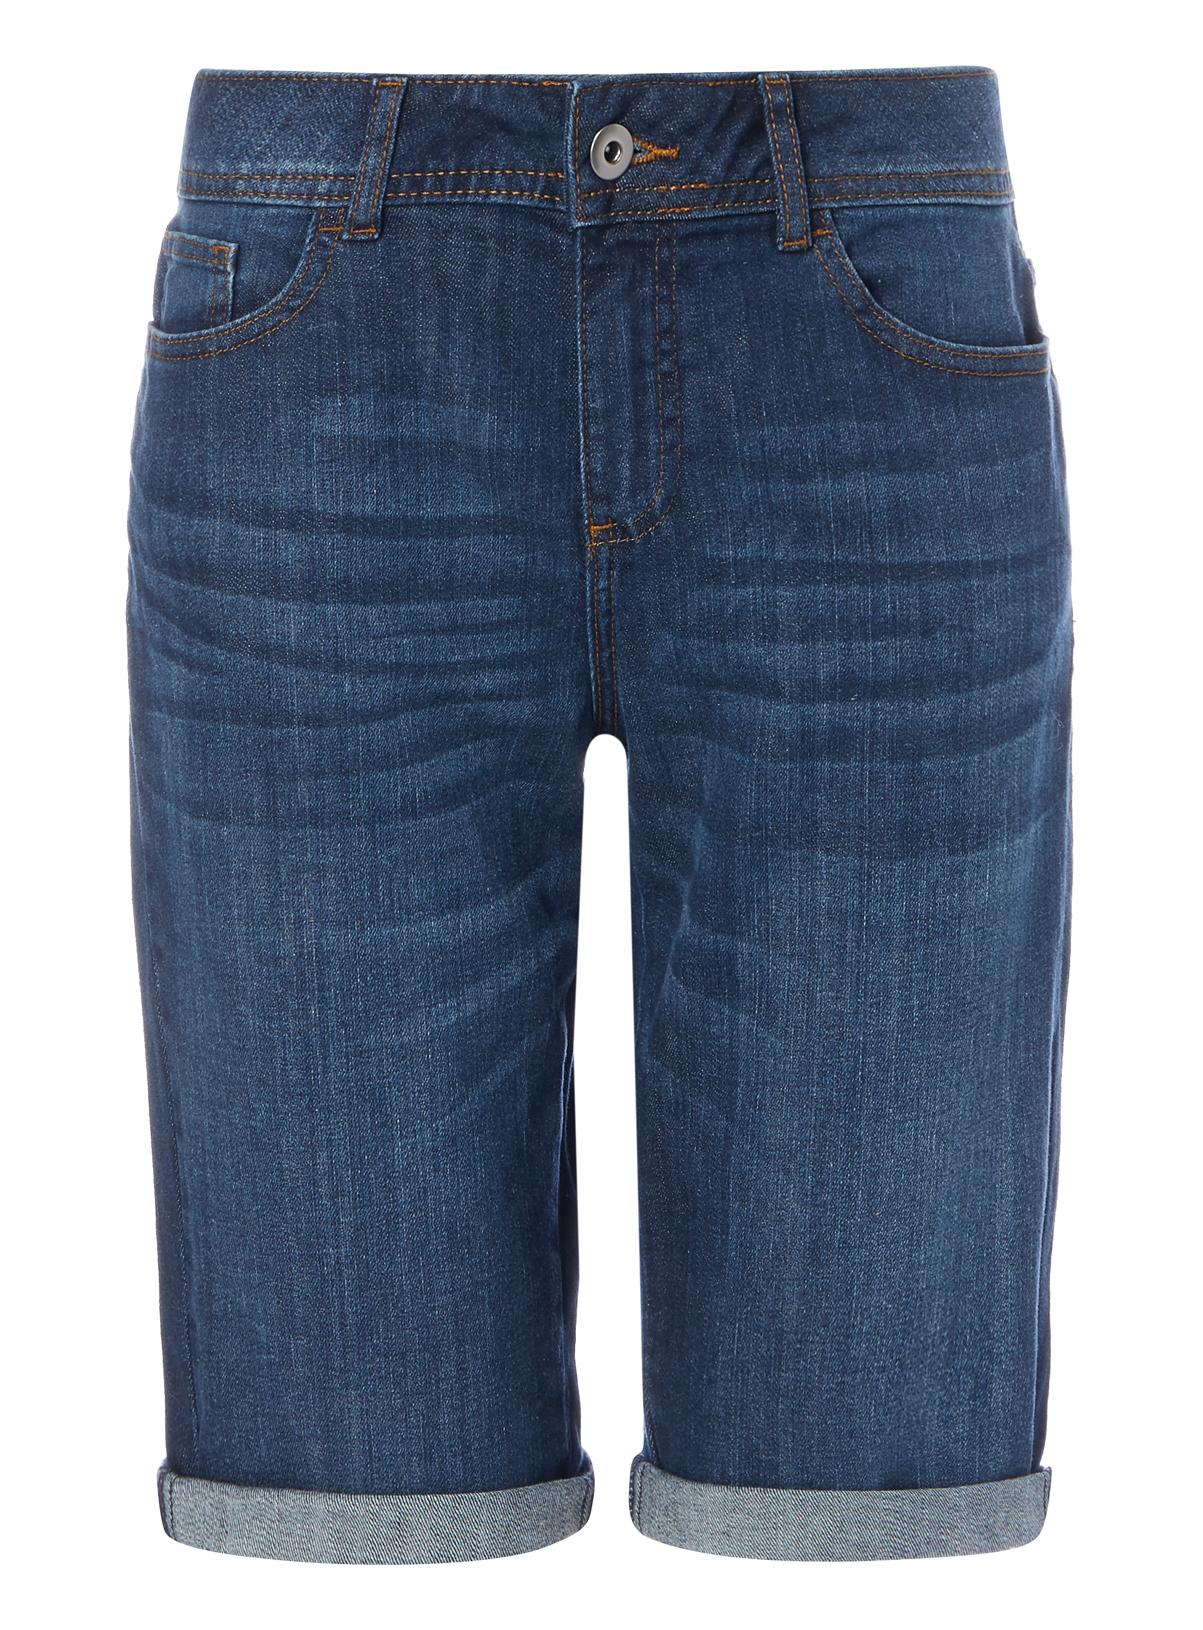 Womens Dark Denim Bermuda Shorts | Tu clothing